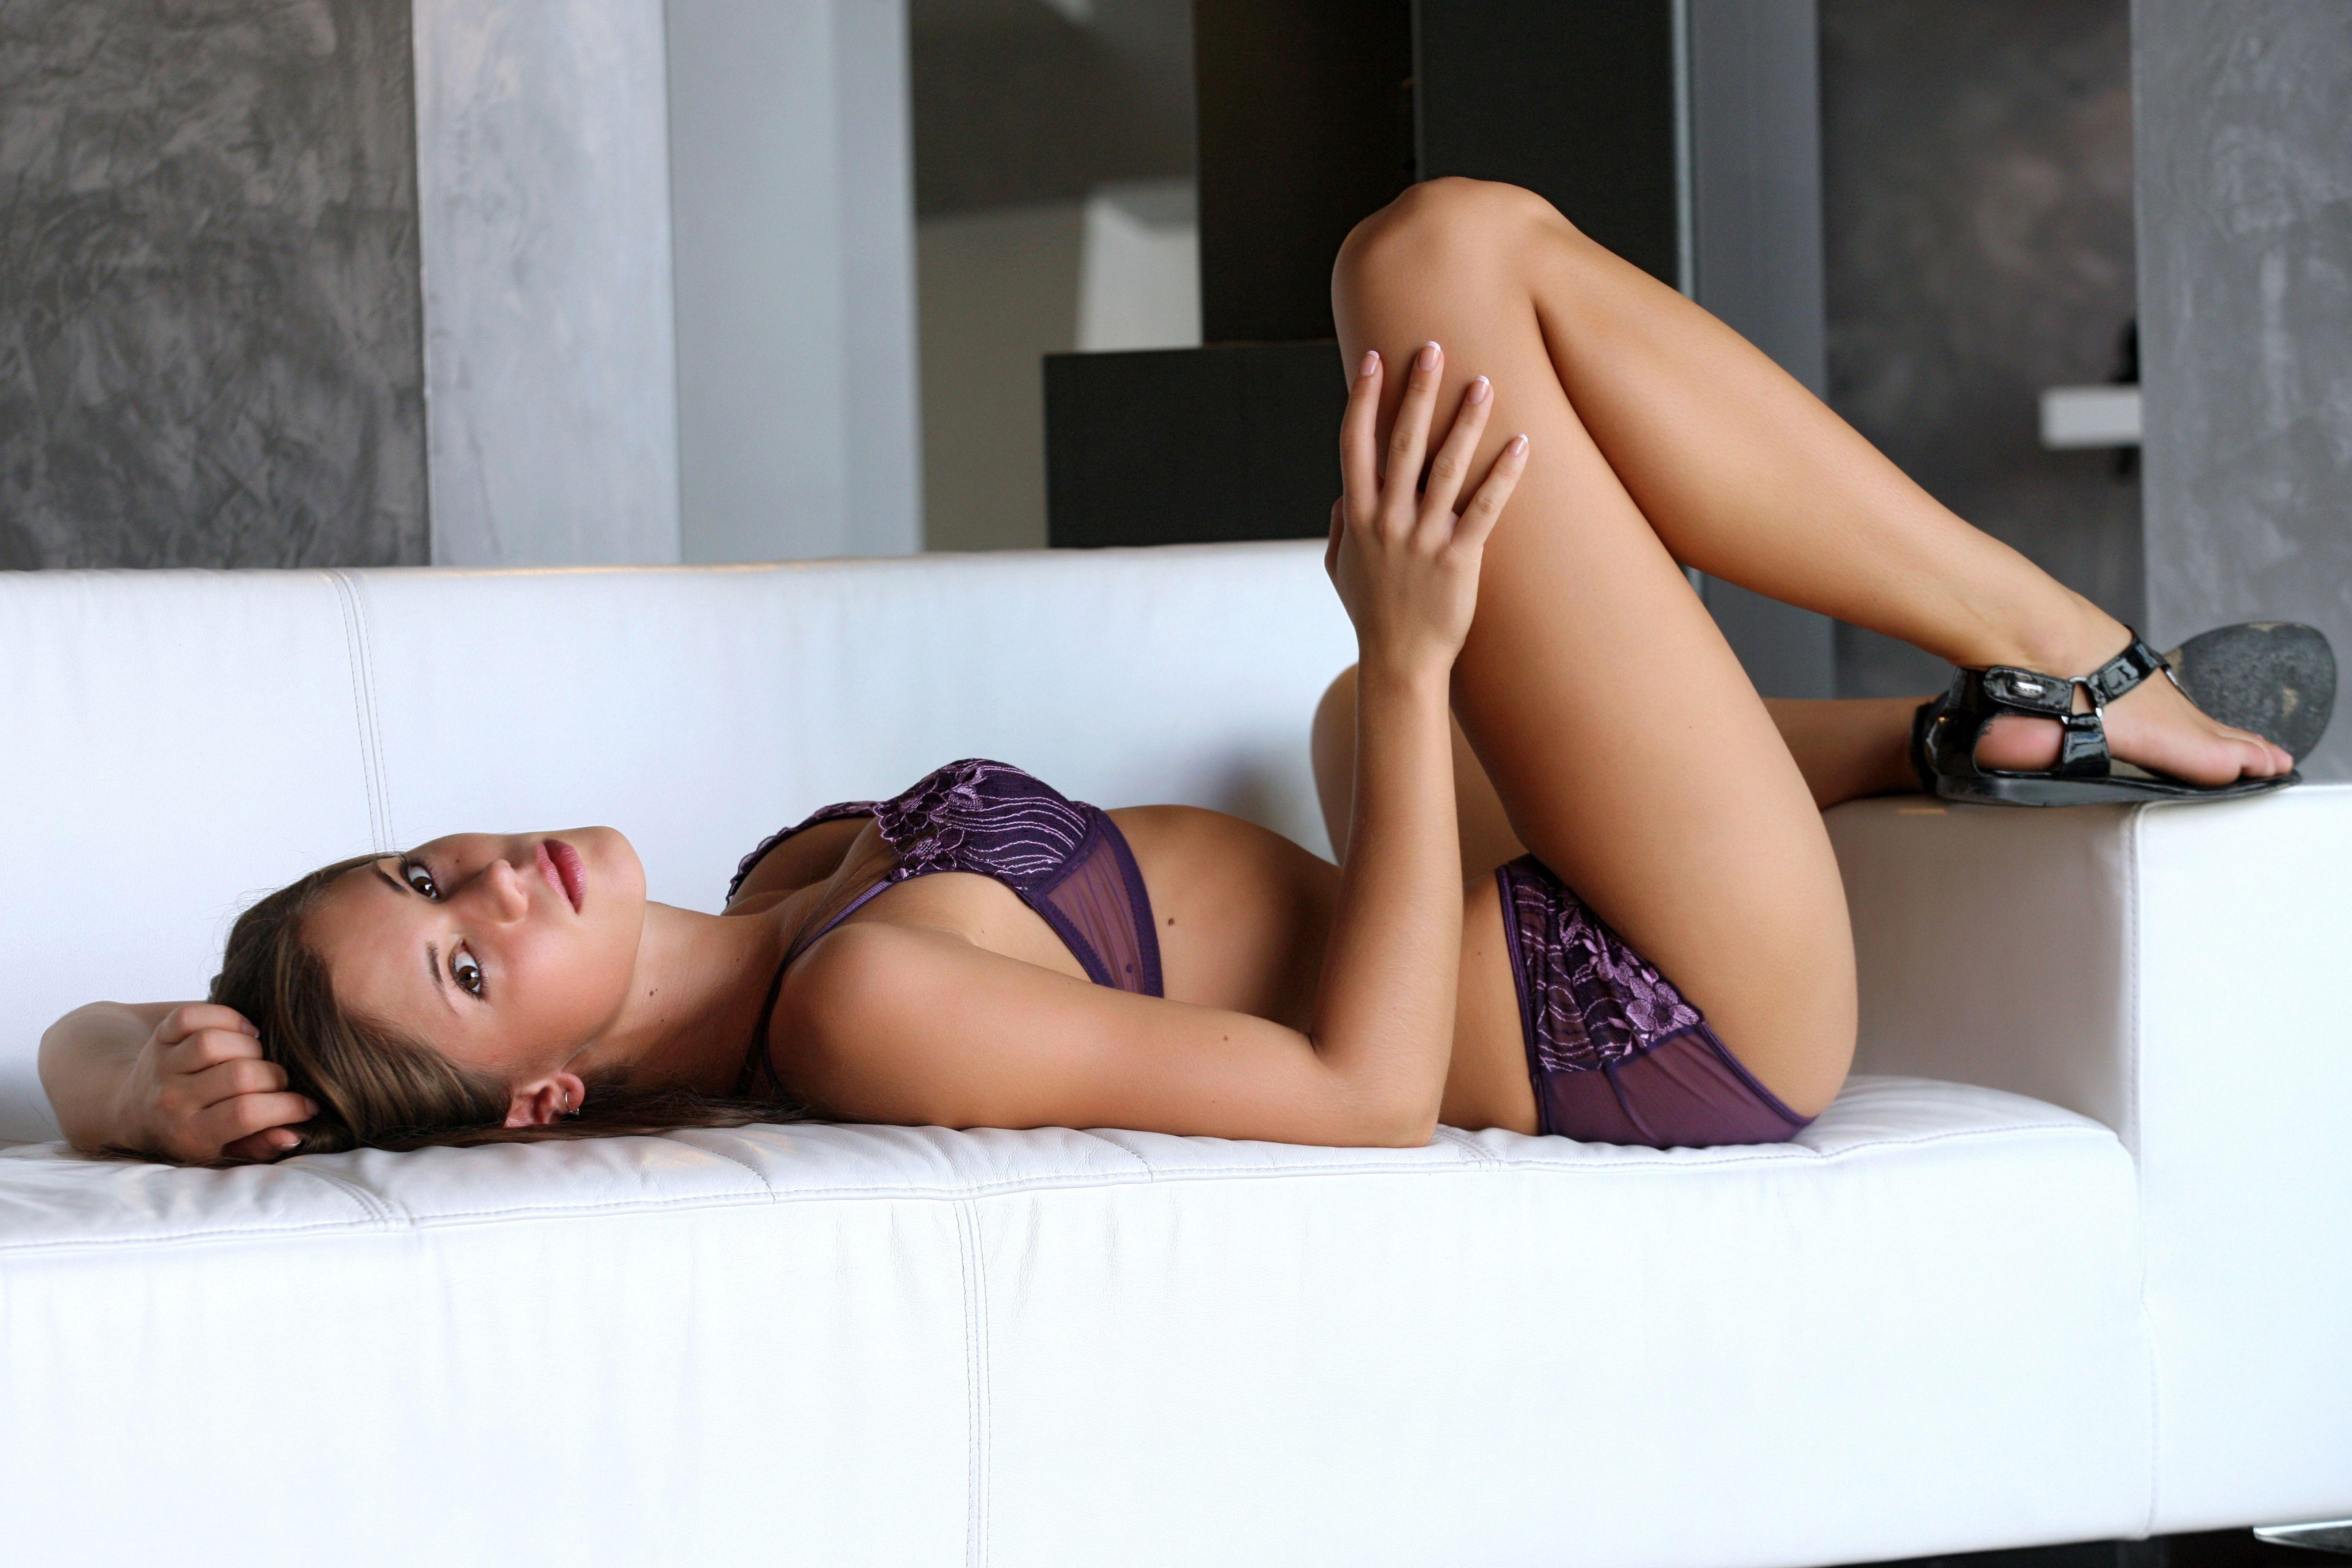 Wallpaper Caprice, Sexy, Sweet, Cute, Lingerie, Beautiful -7570